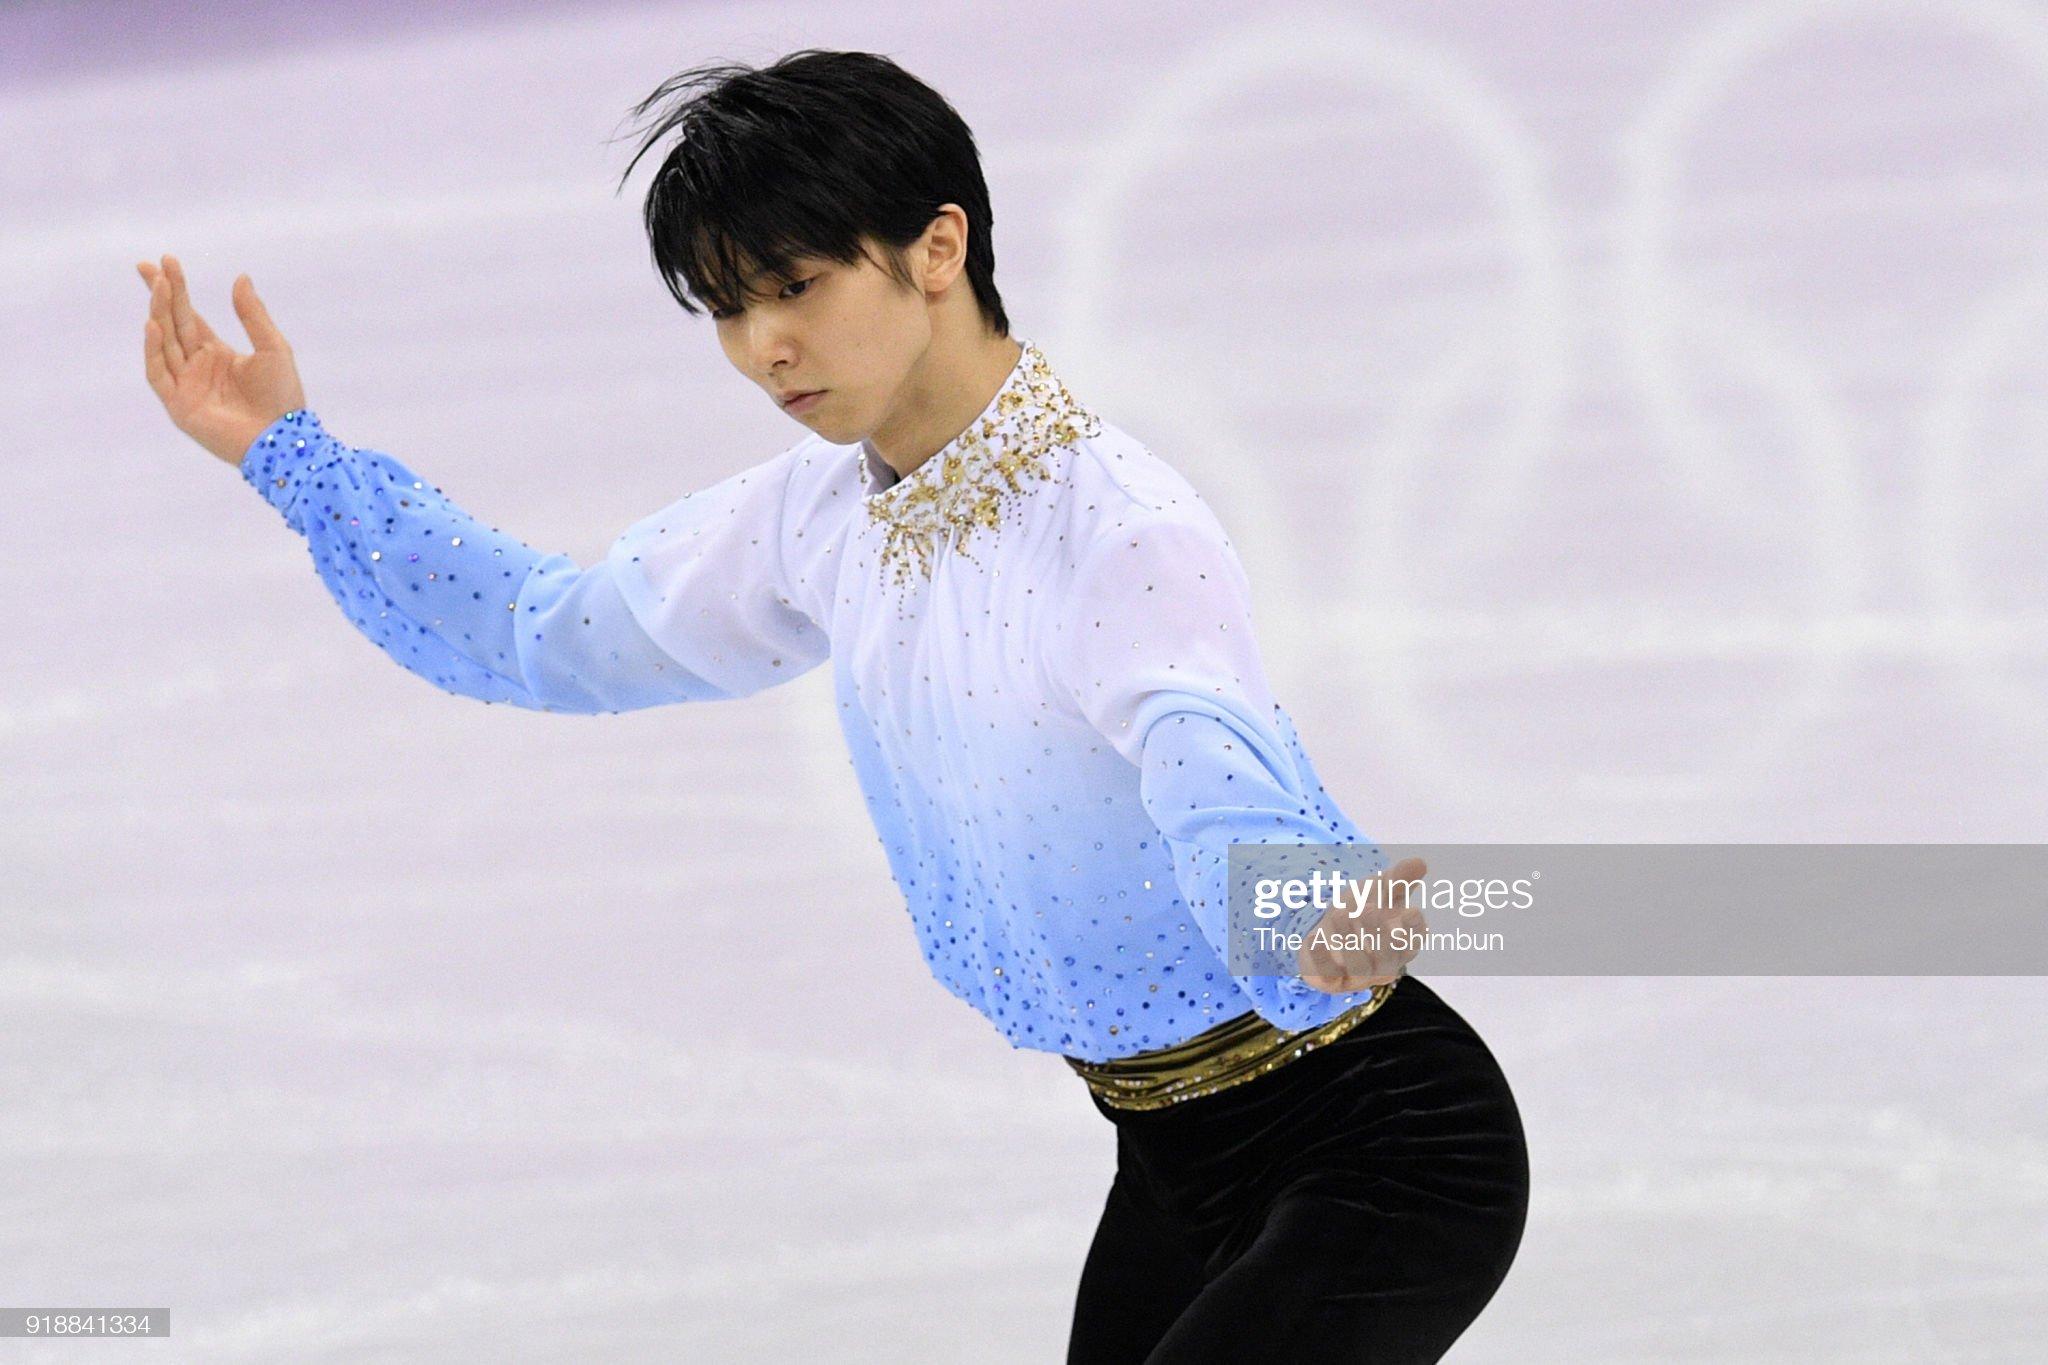 yuzuru-hanyu-of-japan-competes-in-the-me